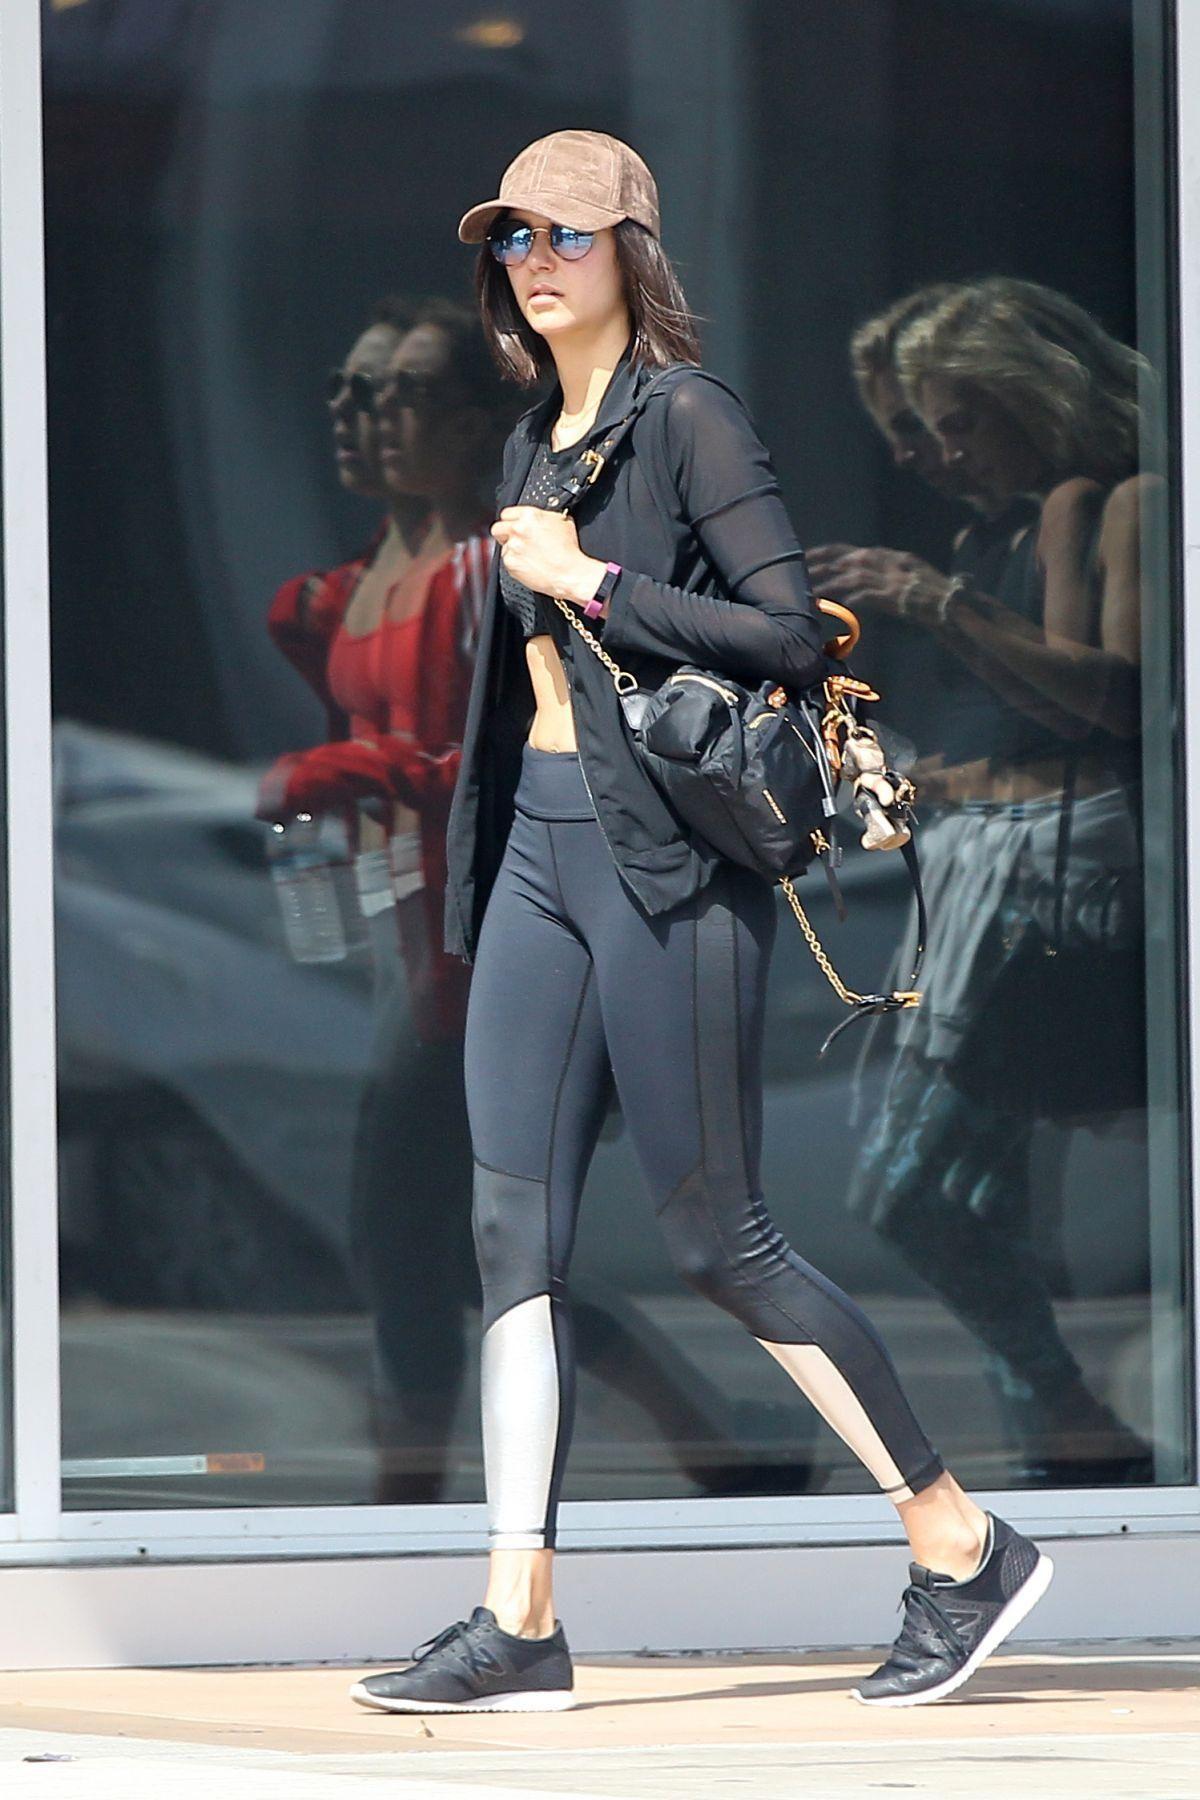 dc65ca5d167 Nina Dobrev Los Angeles  carrying  burberry backpack! from   NinaDobrev Fan s closet